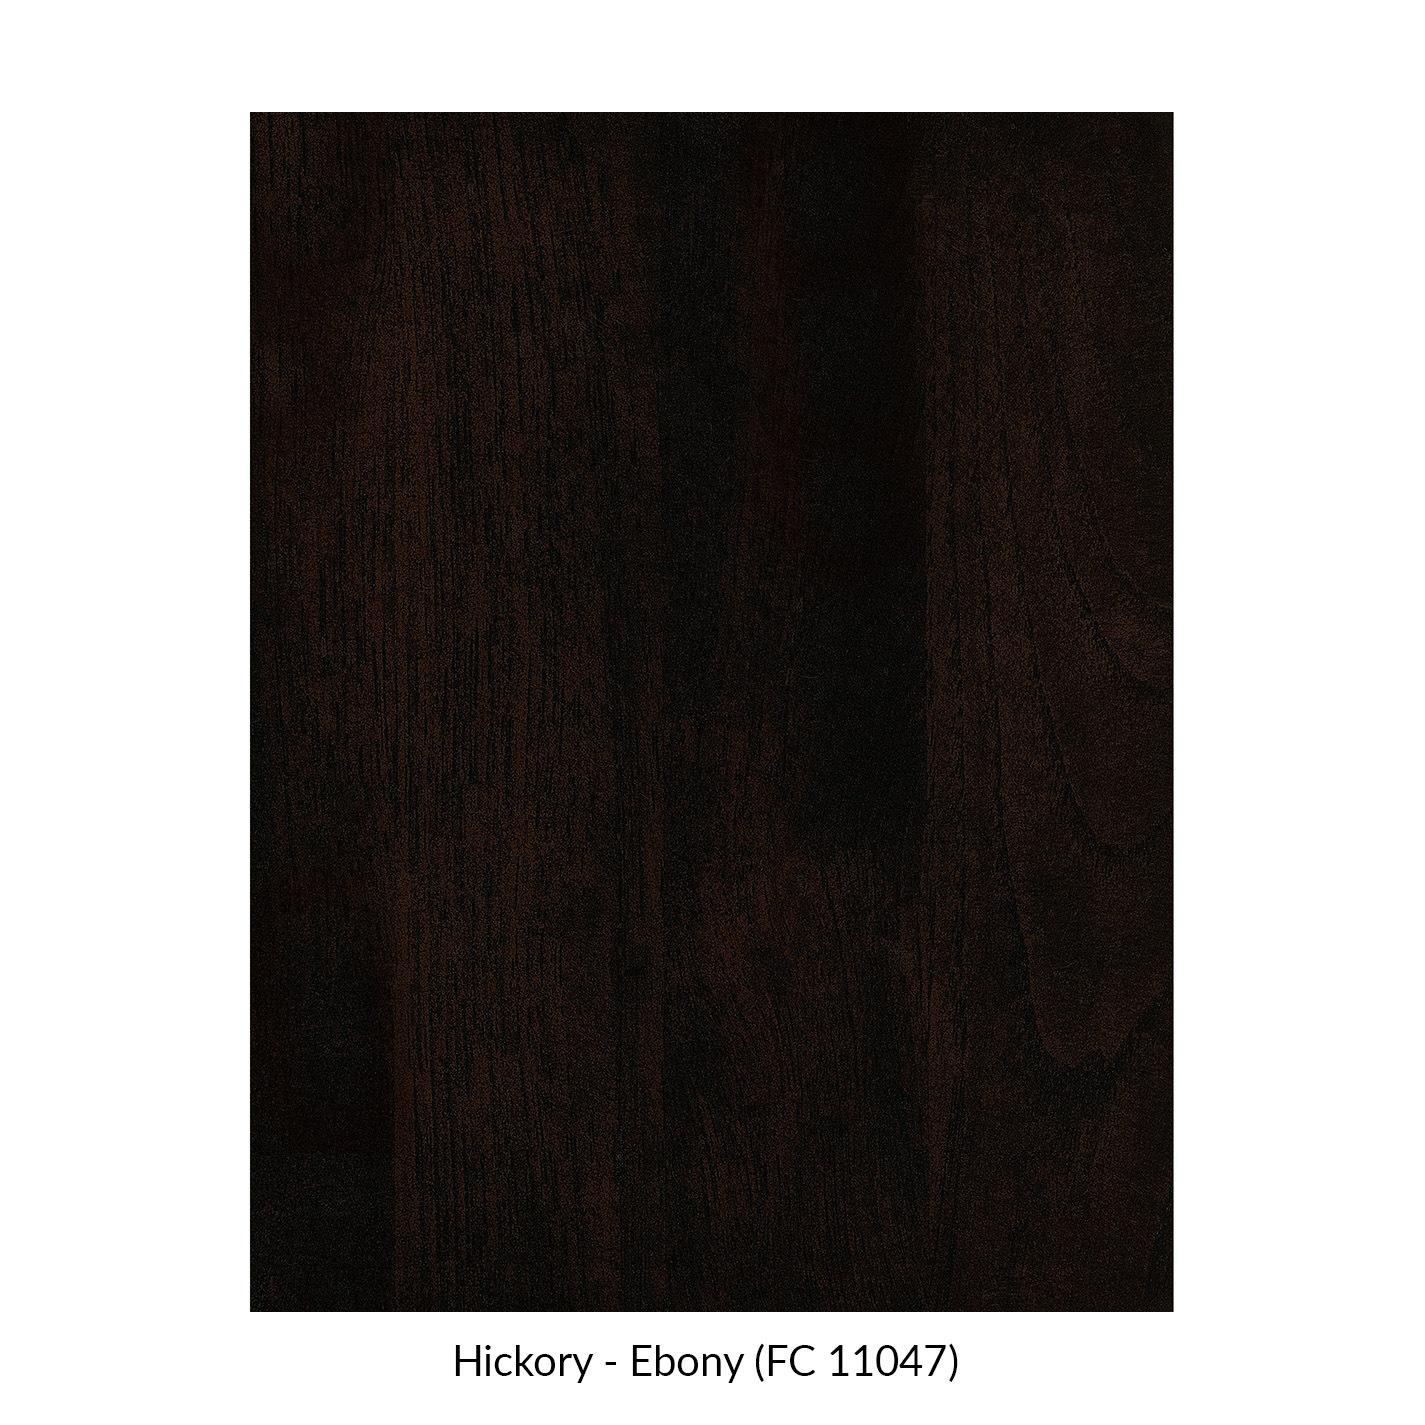 spectrum-hickory-ebony-fc-11047.jpg